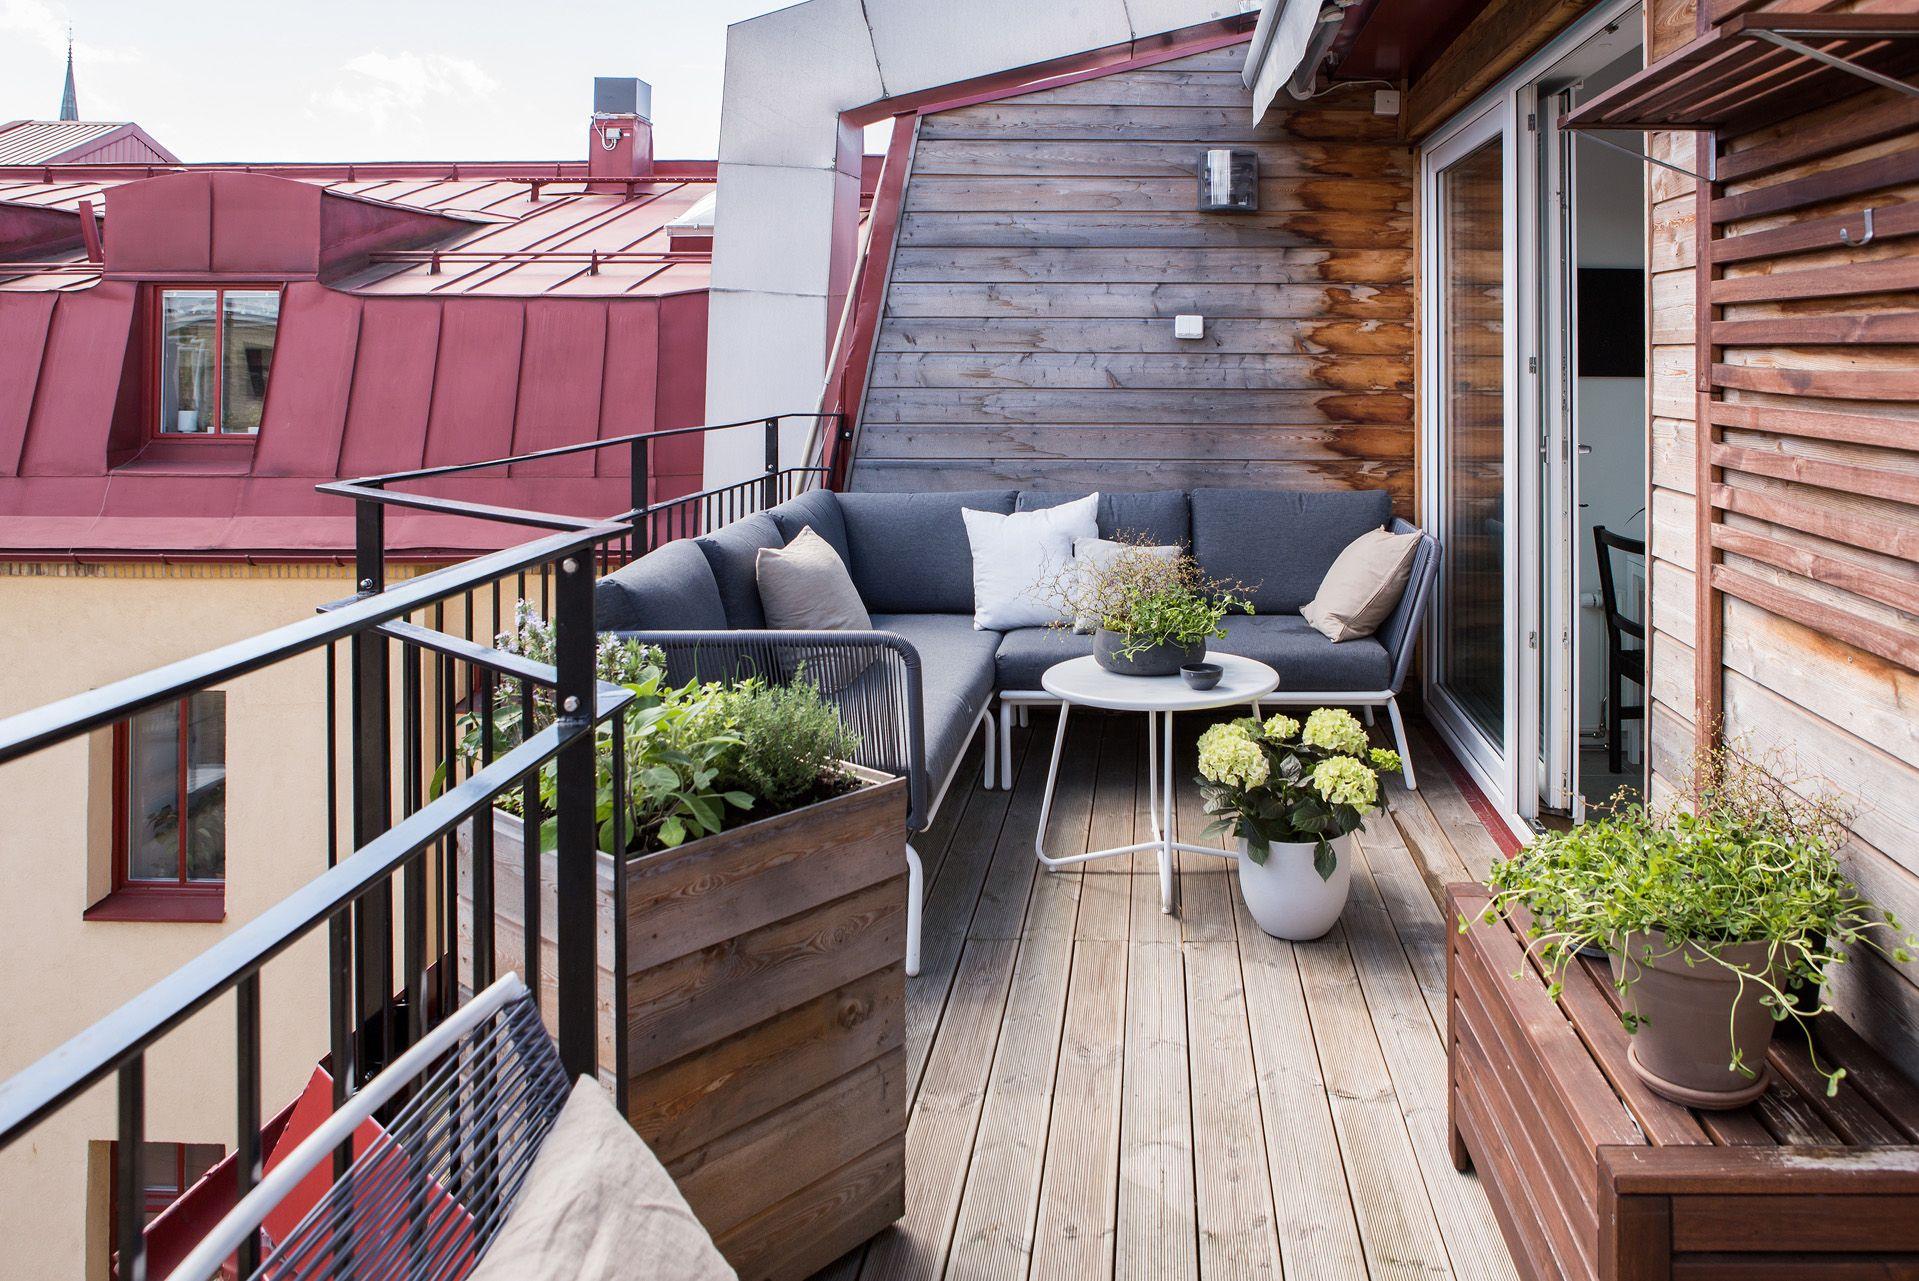 Bohemian Balkon Inrichting : Zonnig ruim balkon terras van m balk balcony